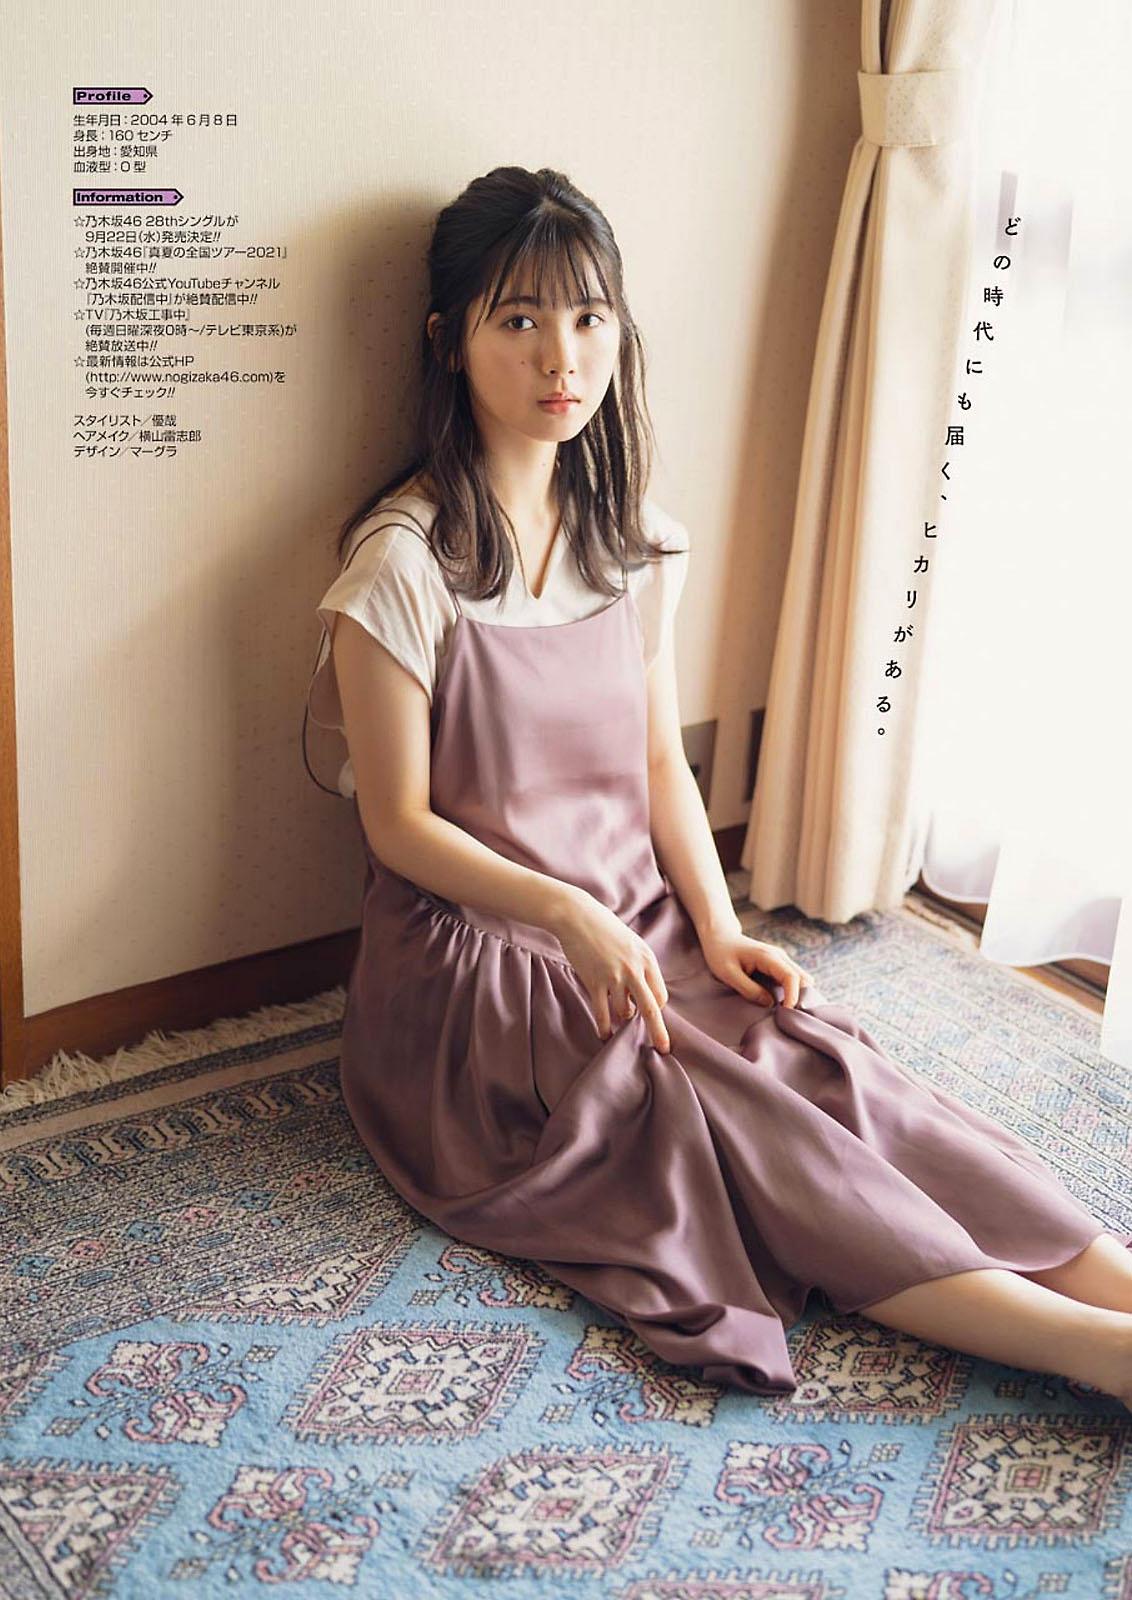 Tsutsue Auame Young Gangan 210917 11.jpg